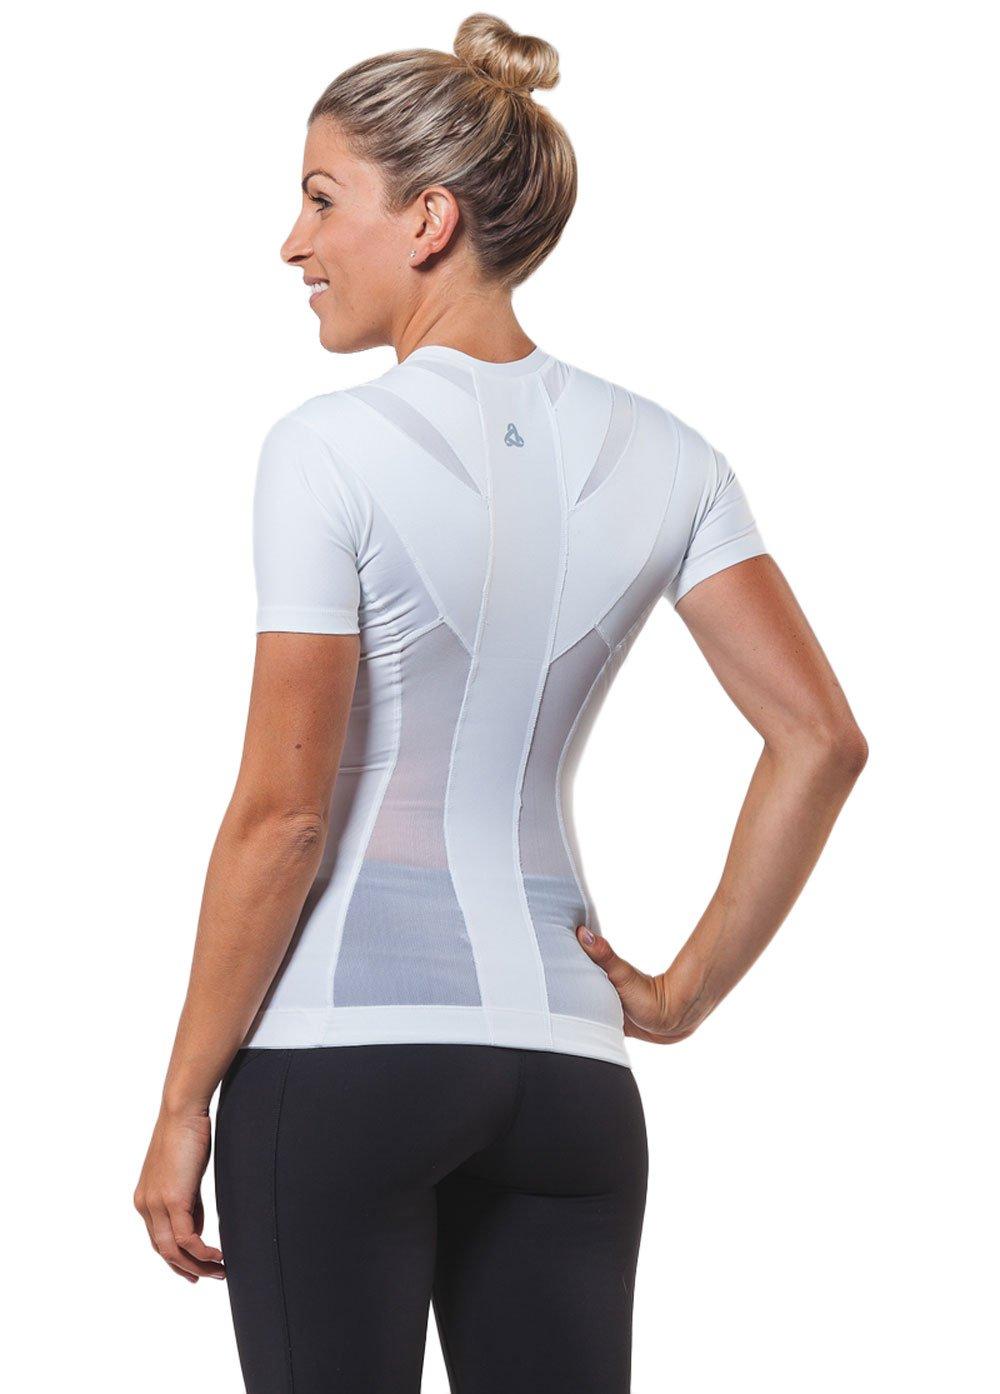 Amazon.com: AlignMed Women's Posture Shirt® 2.0 (Large